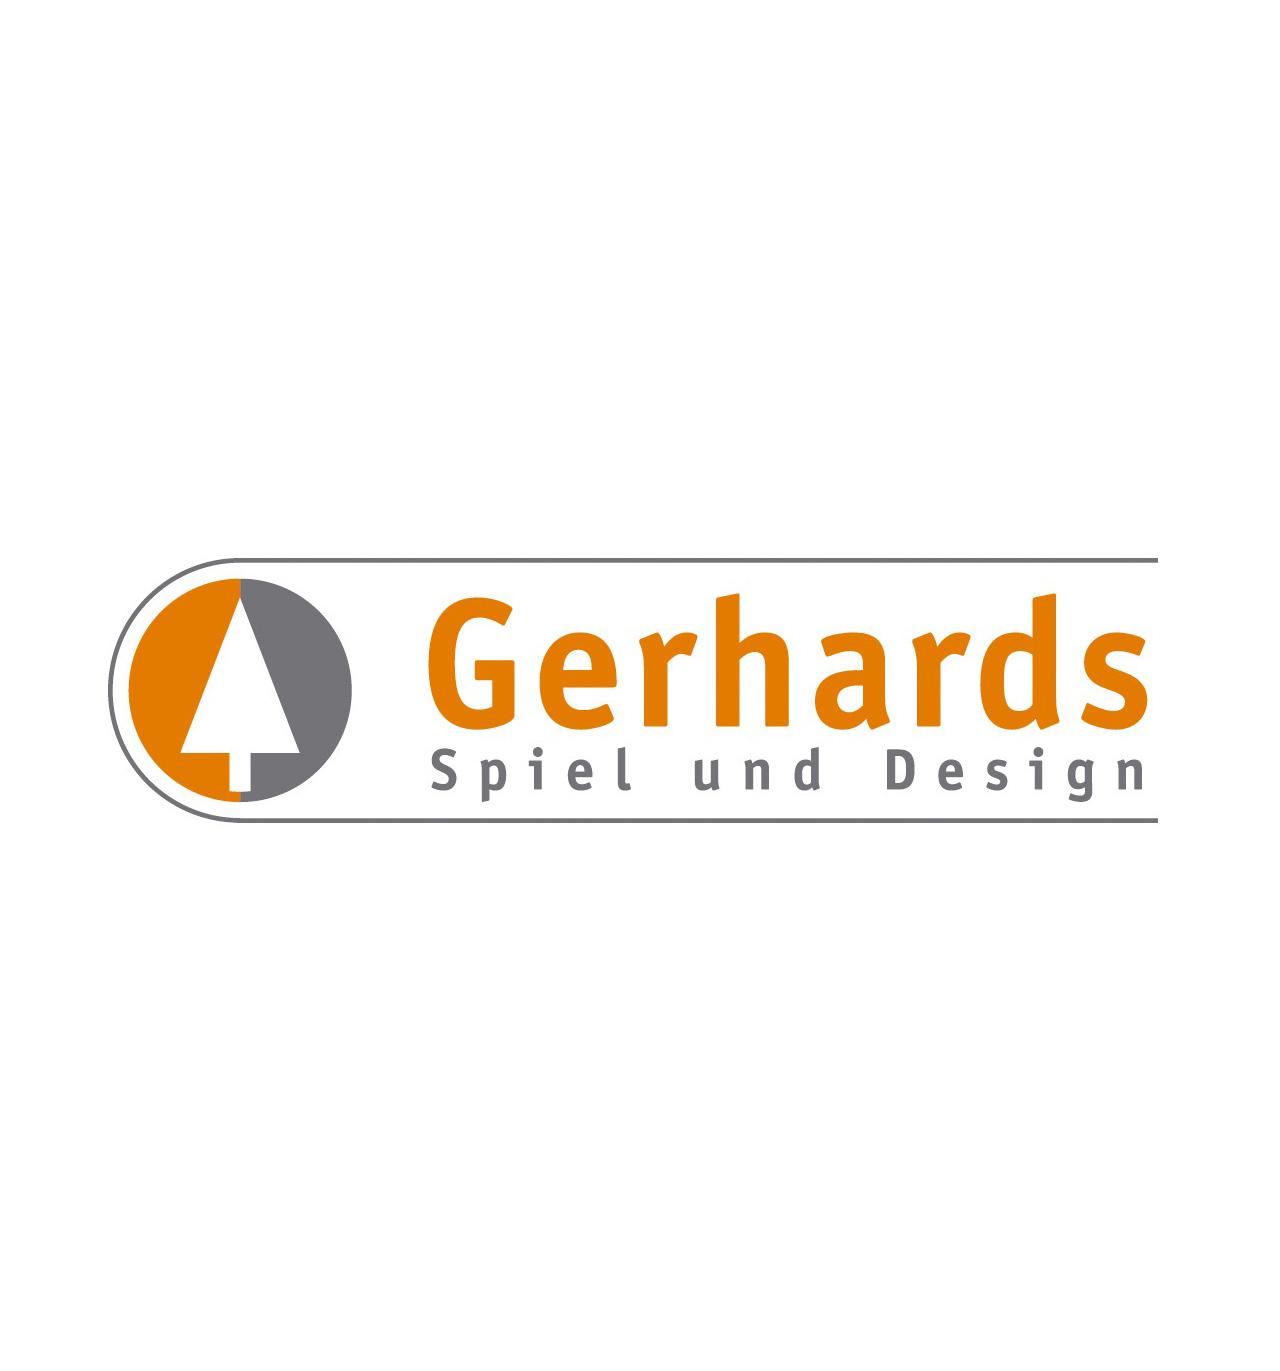 Gerhards